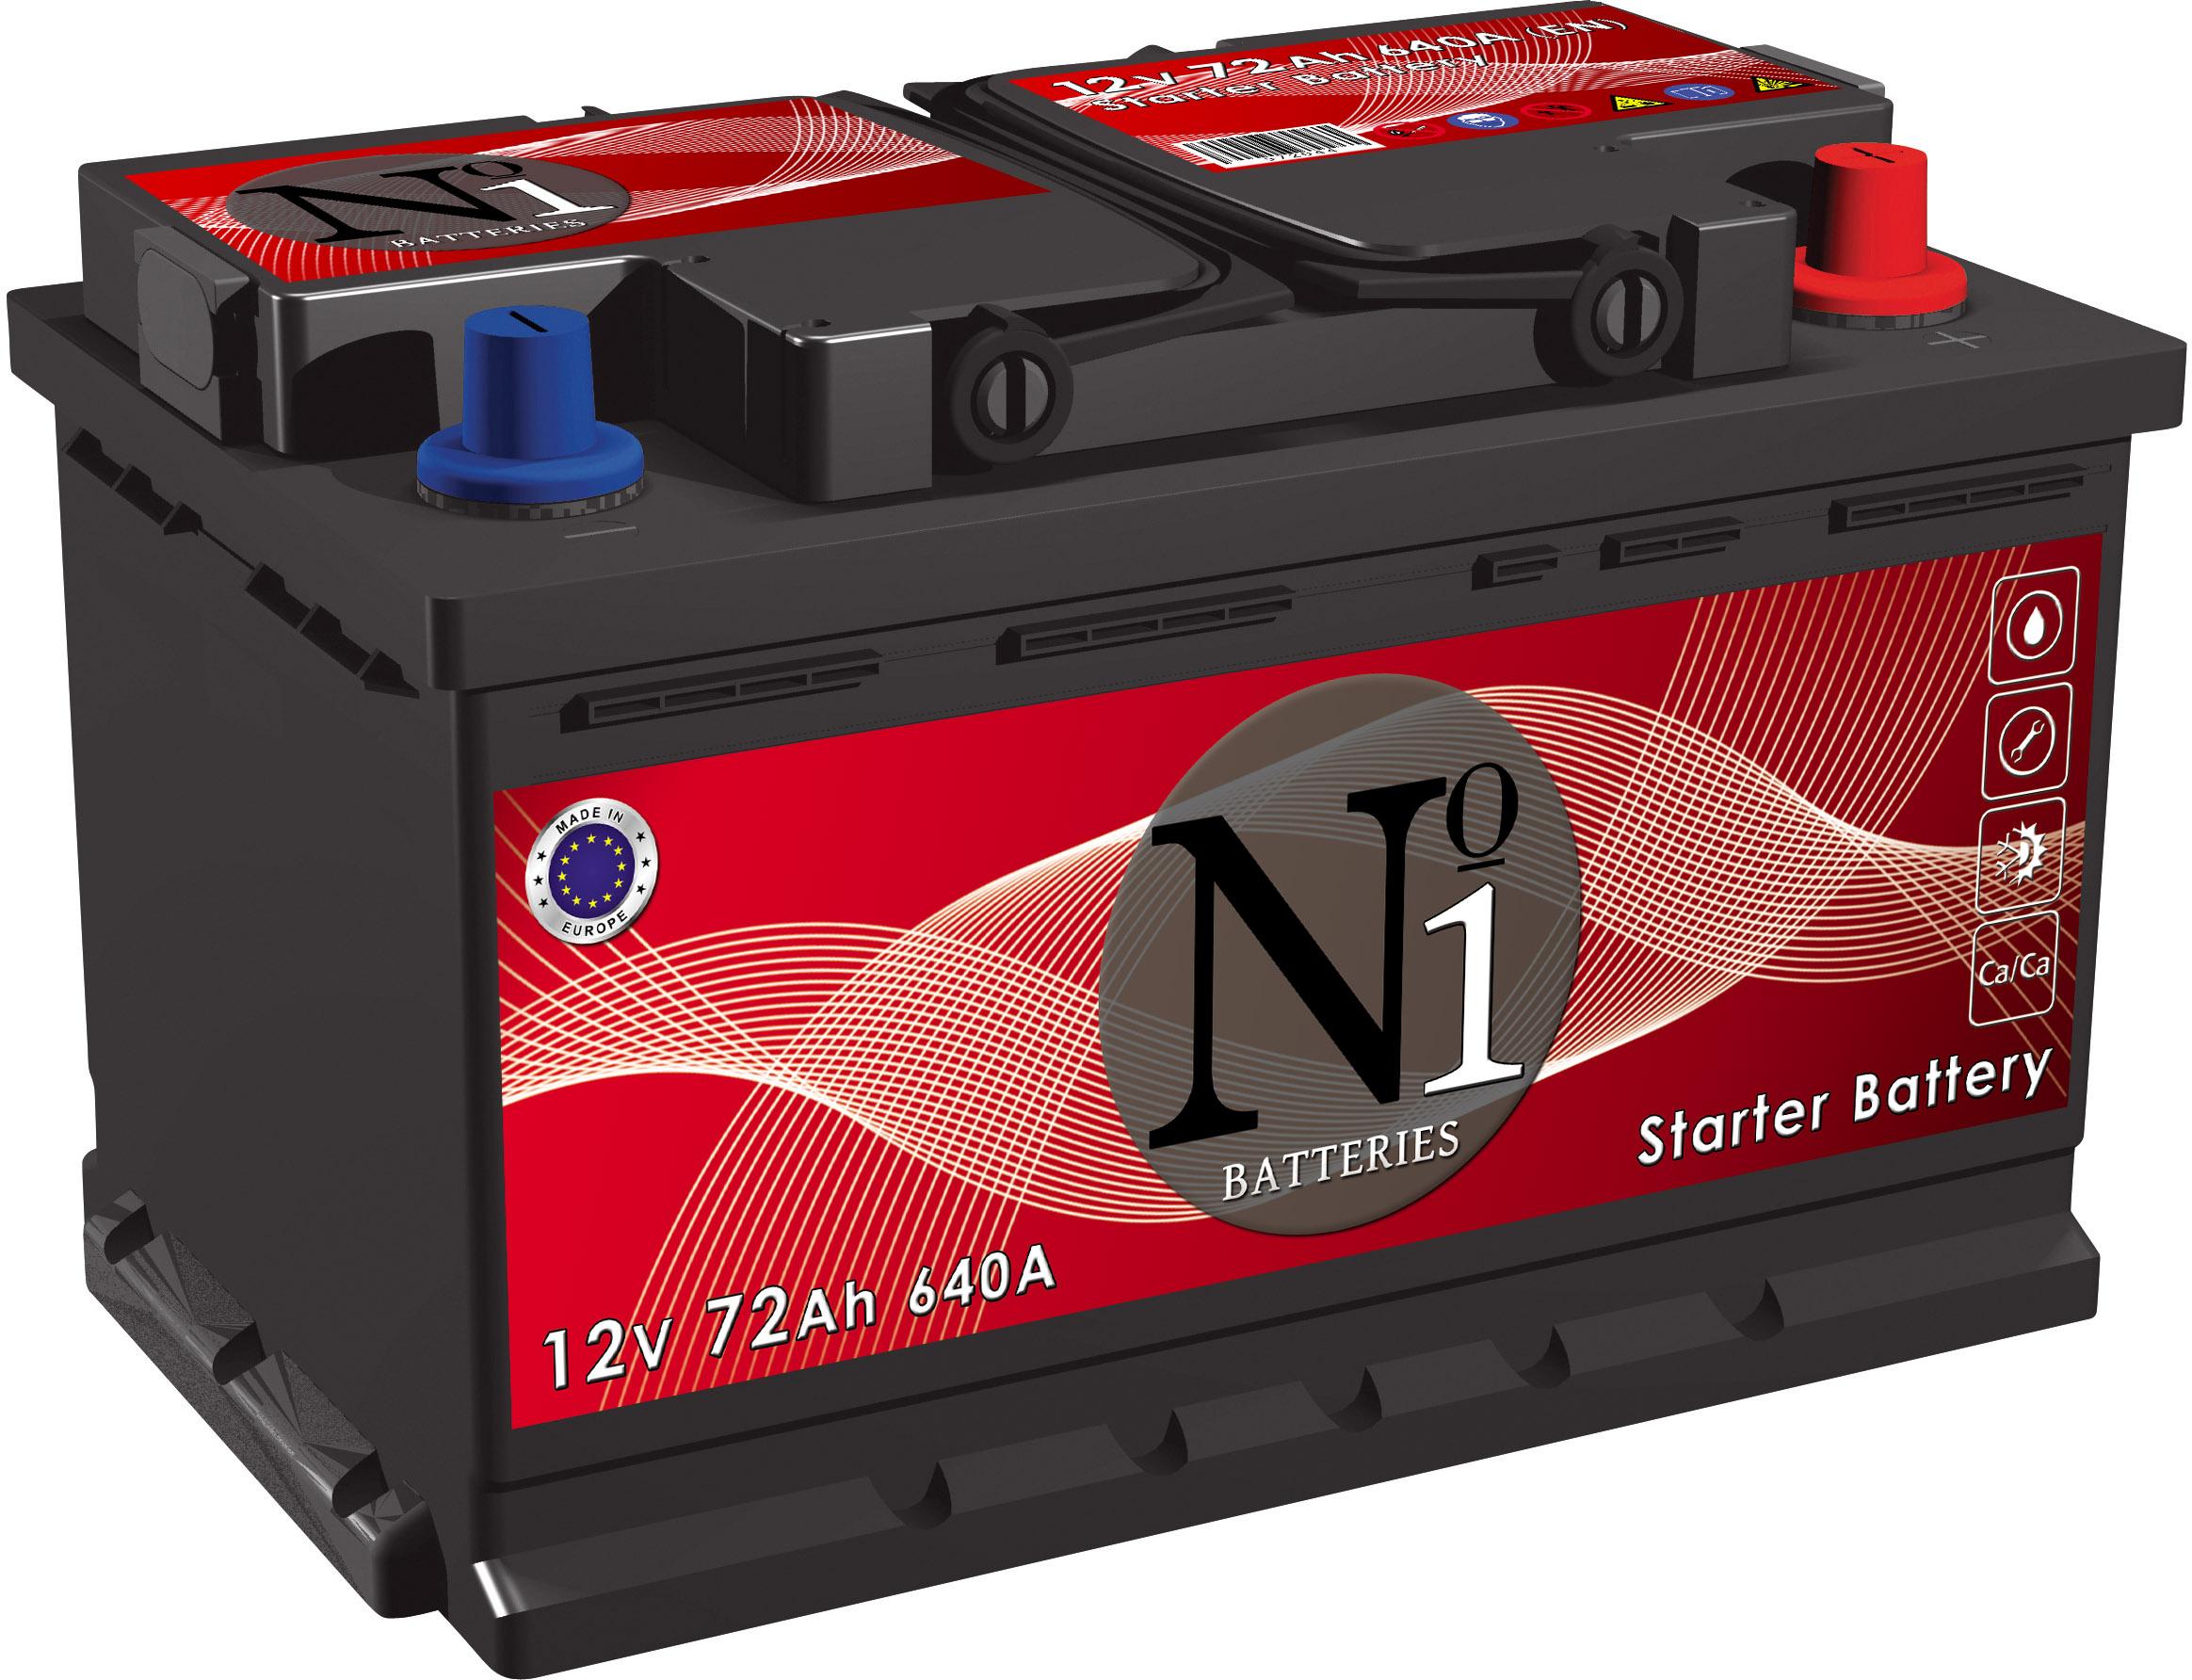 No1-Batteries-Starter-CaCa-technology-12V--72-Ah-jobb--normal-auto-akkumulator-